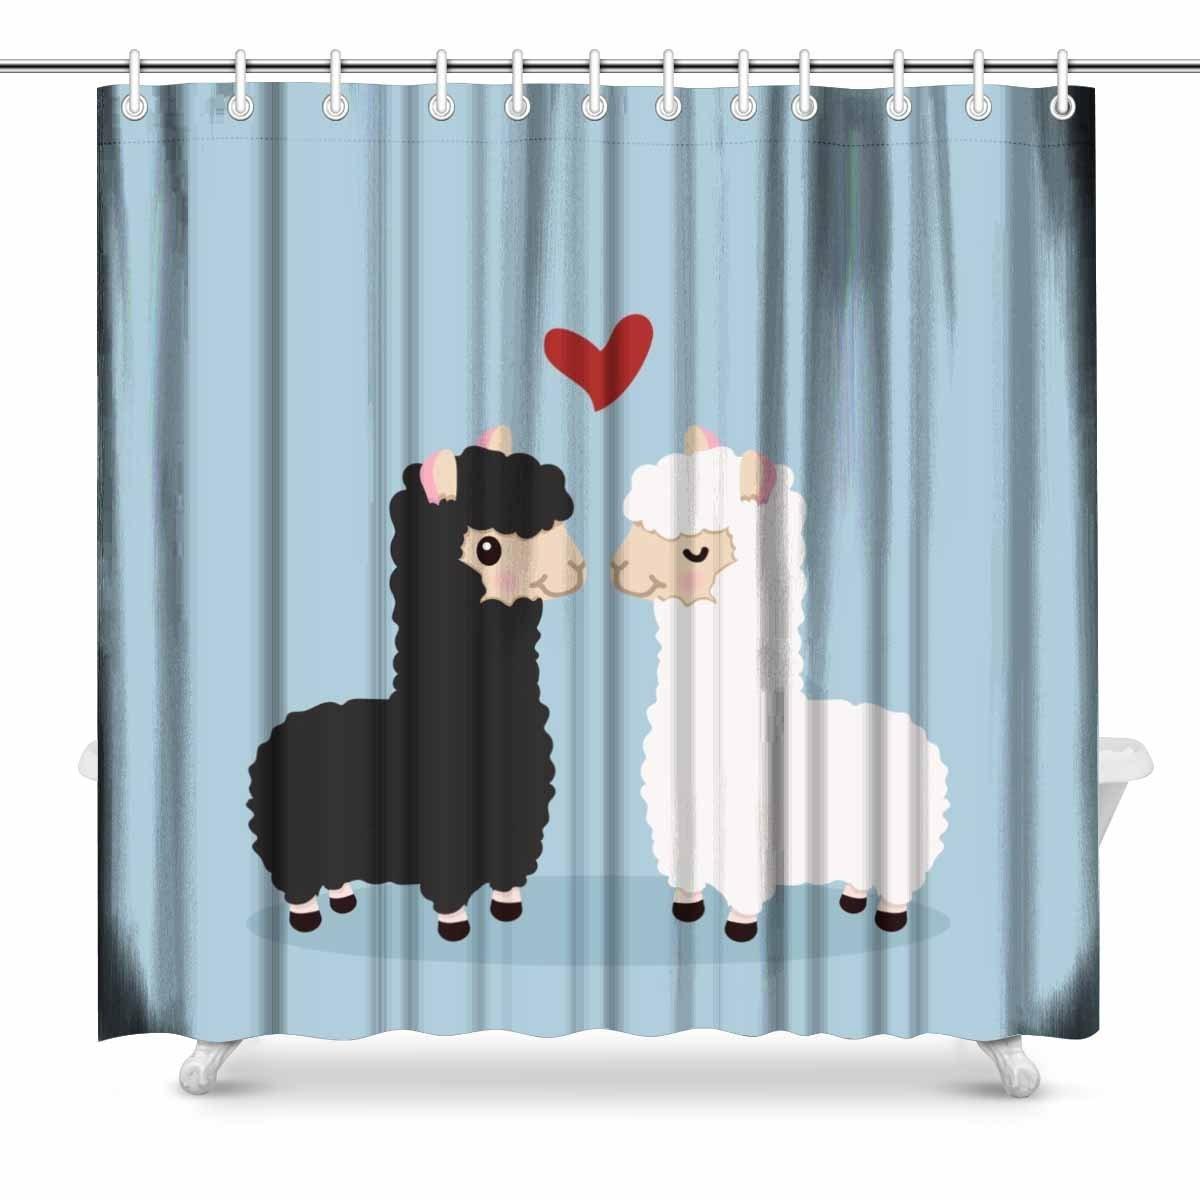 Aplysia Alpaca Couple in Love Fabric Bathroom Shower Curtain Decor ...